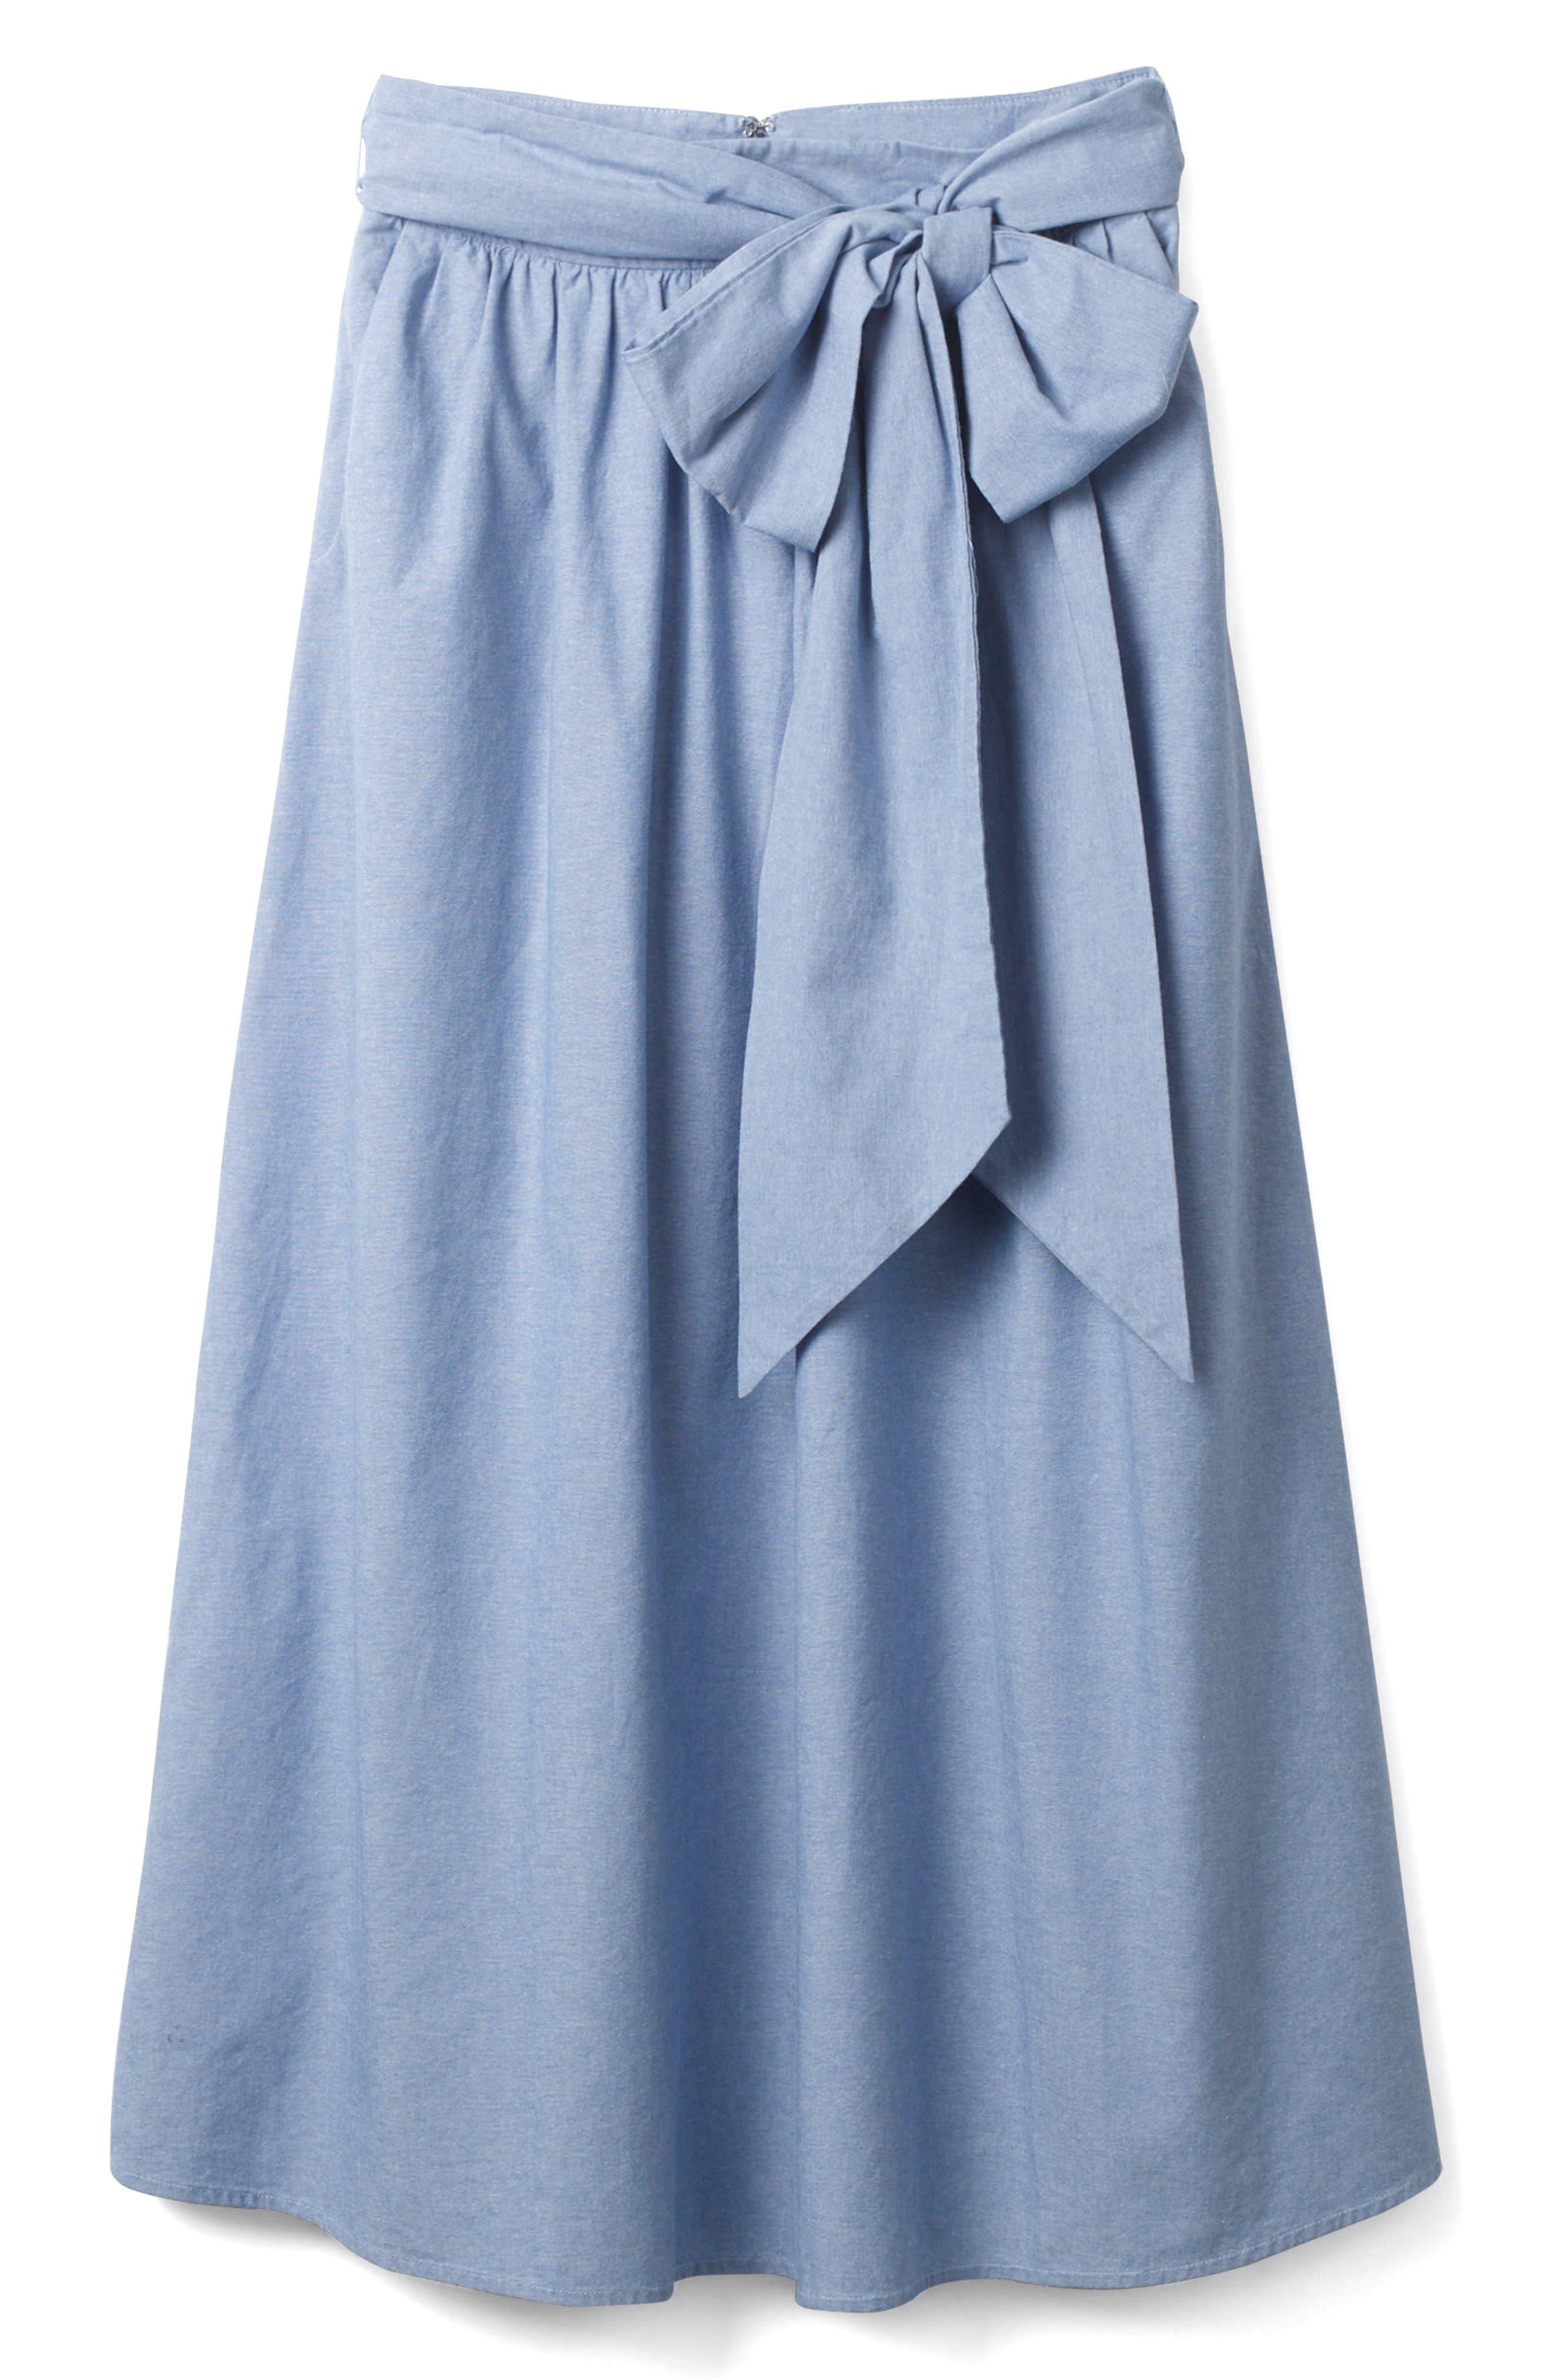 Kiera Midi Skirt,                             Alternate thumbnail 3, color,                             469